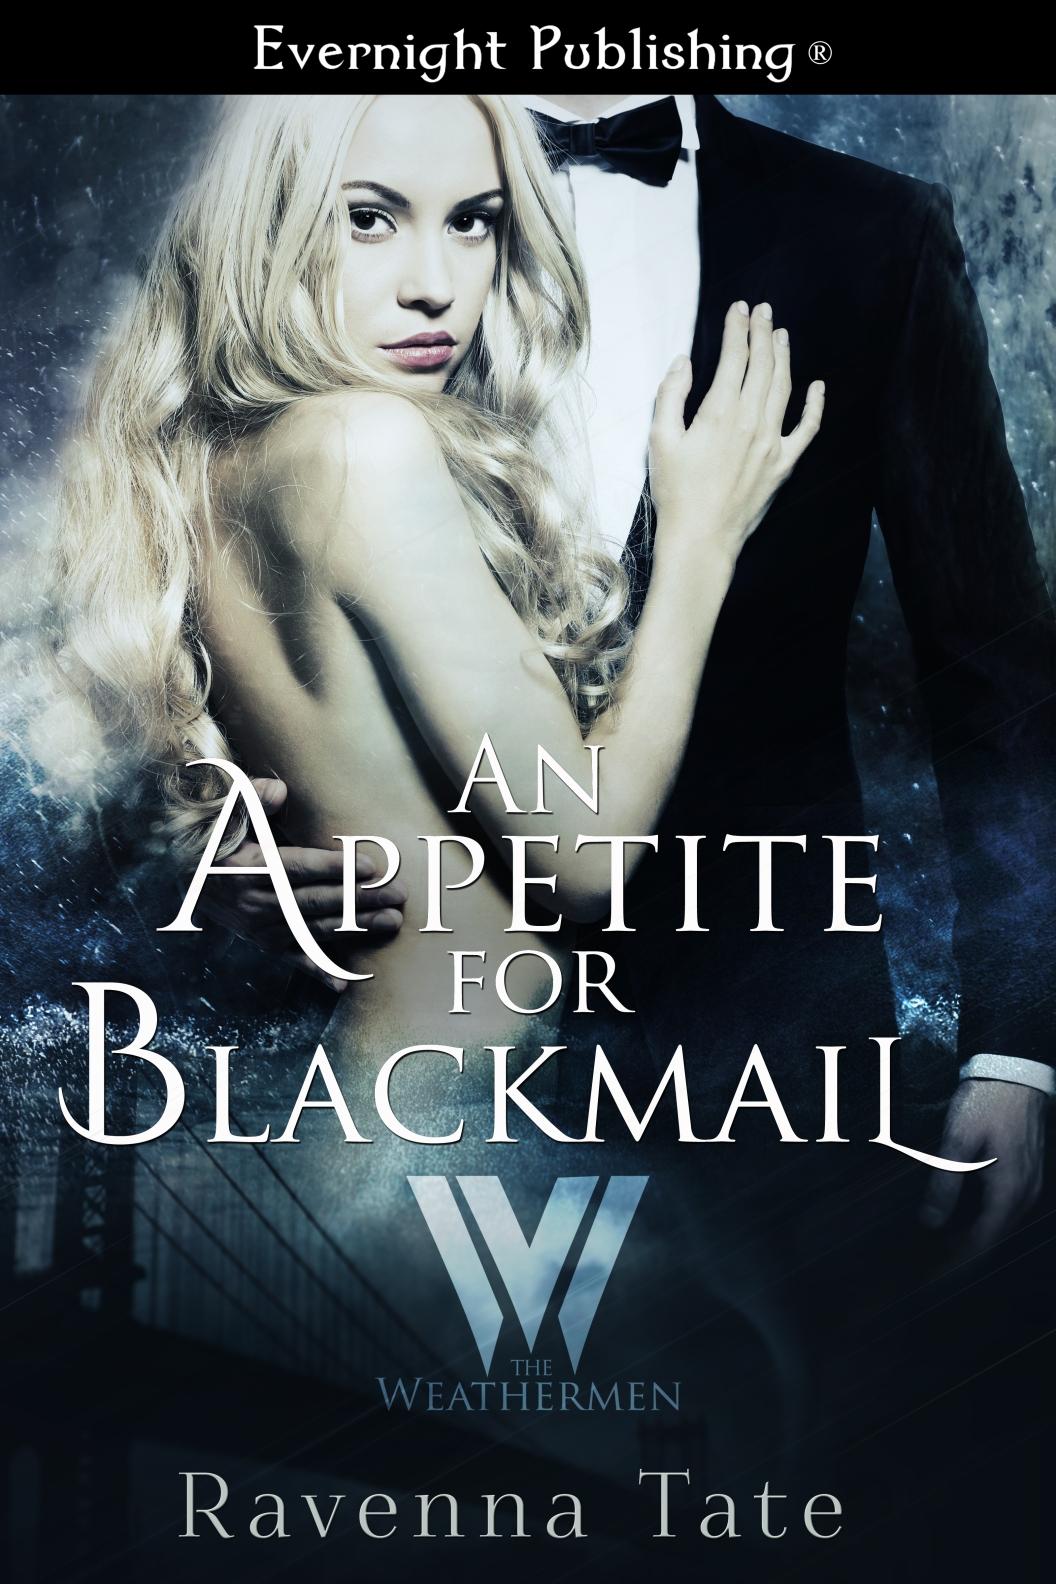 AnAppetiteForBlackmail-evernightpublishing-JayAheer2015-finalcover.jpg